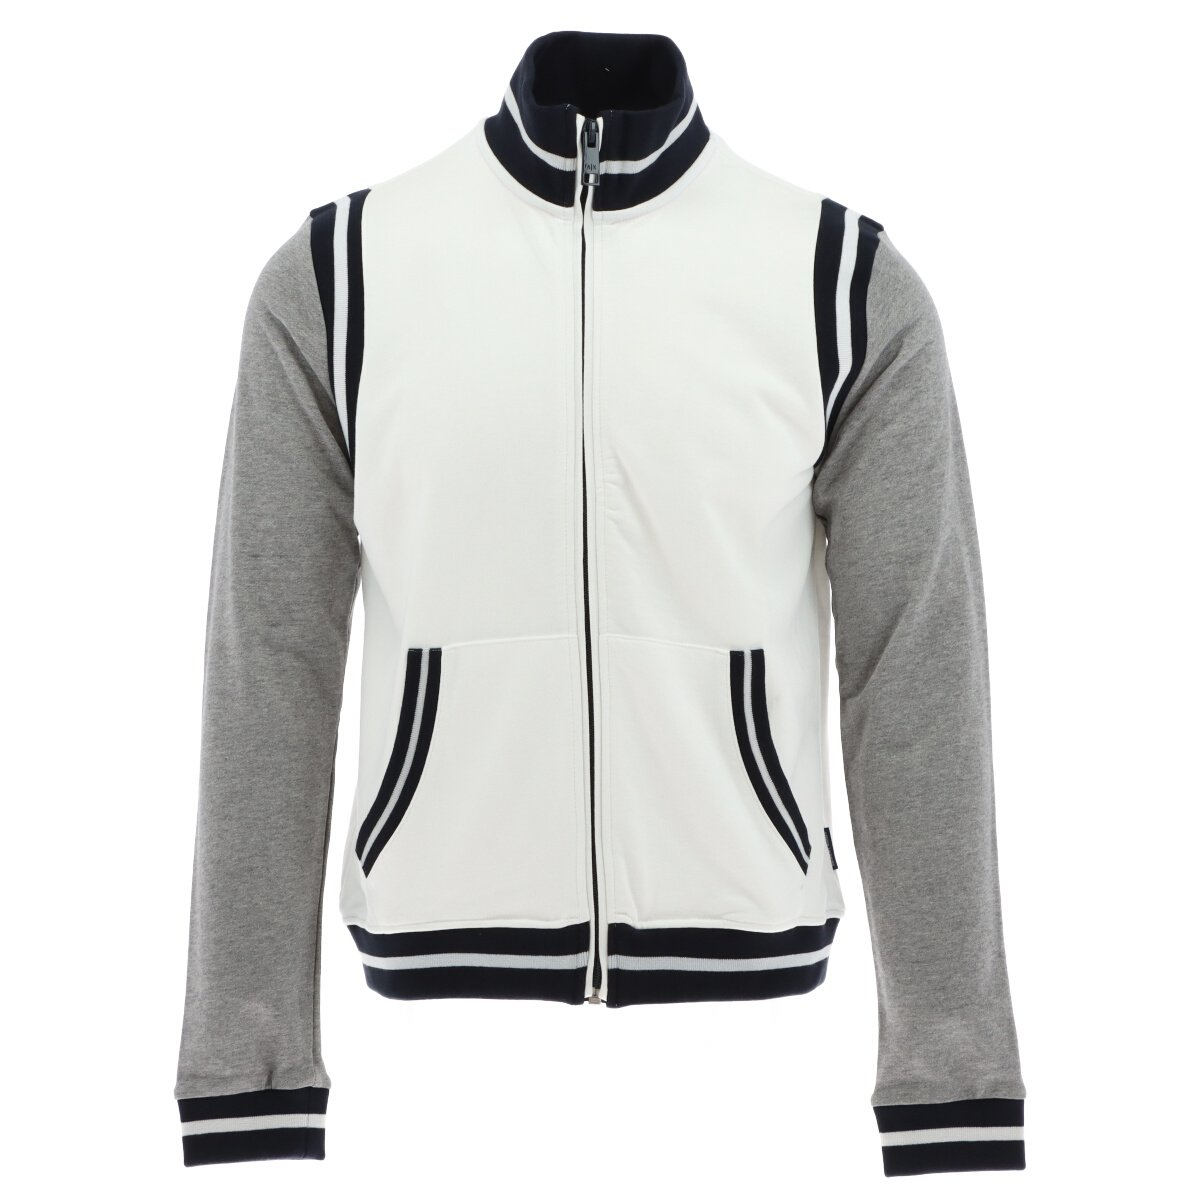 Armani Exchange Men's Sweatshirt Various Colours 279044 - white S